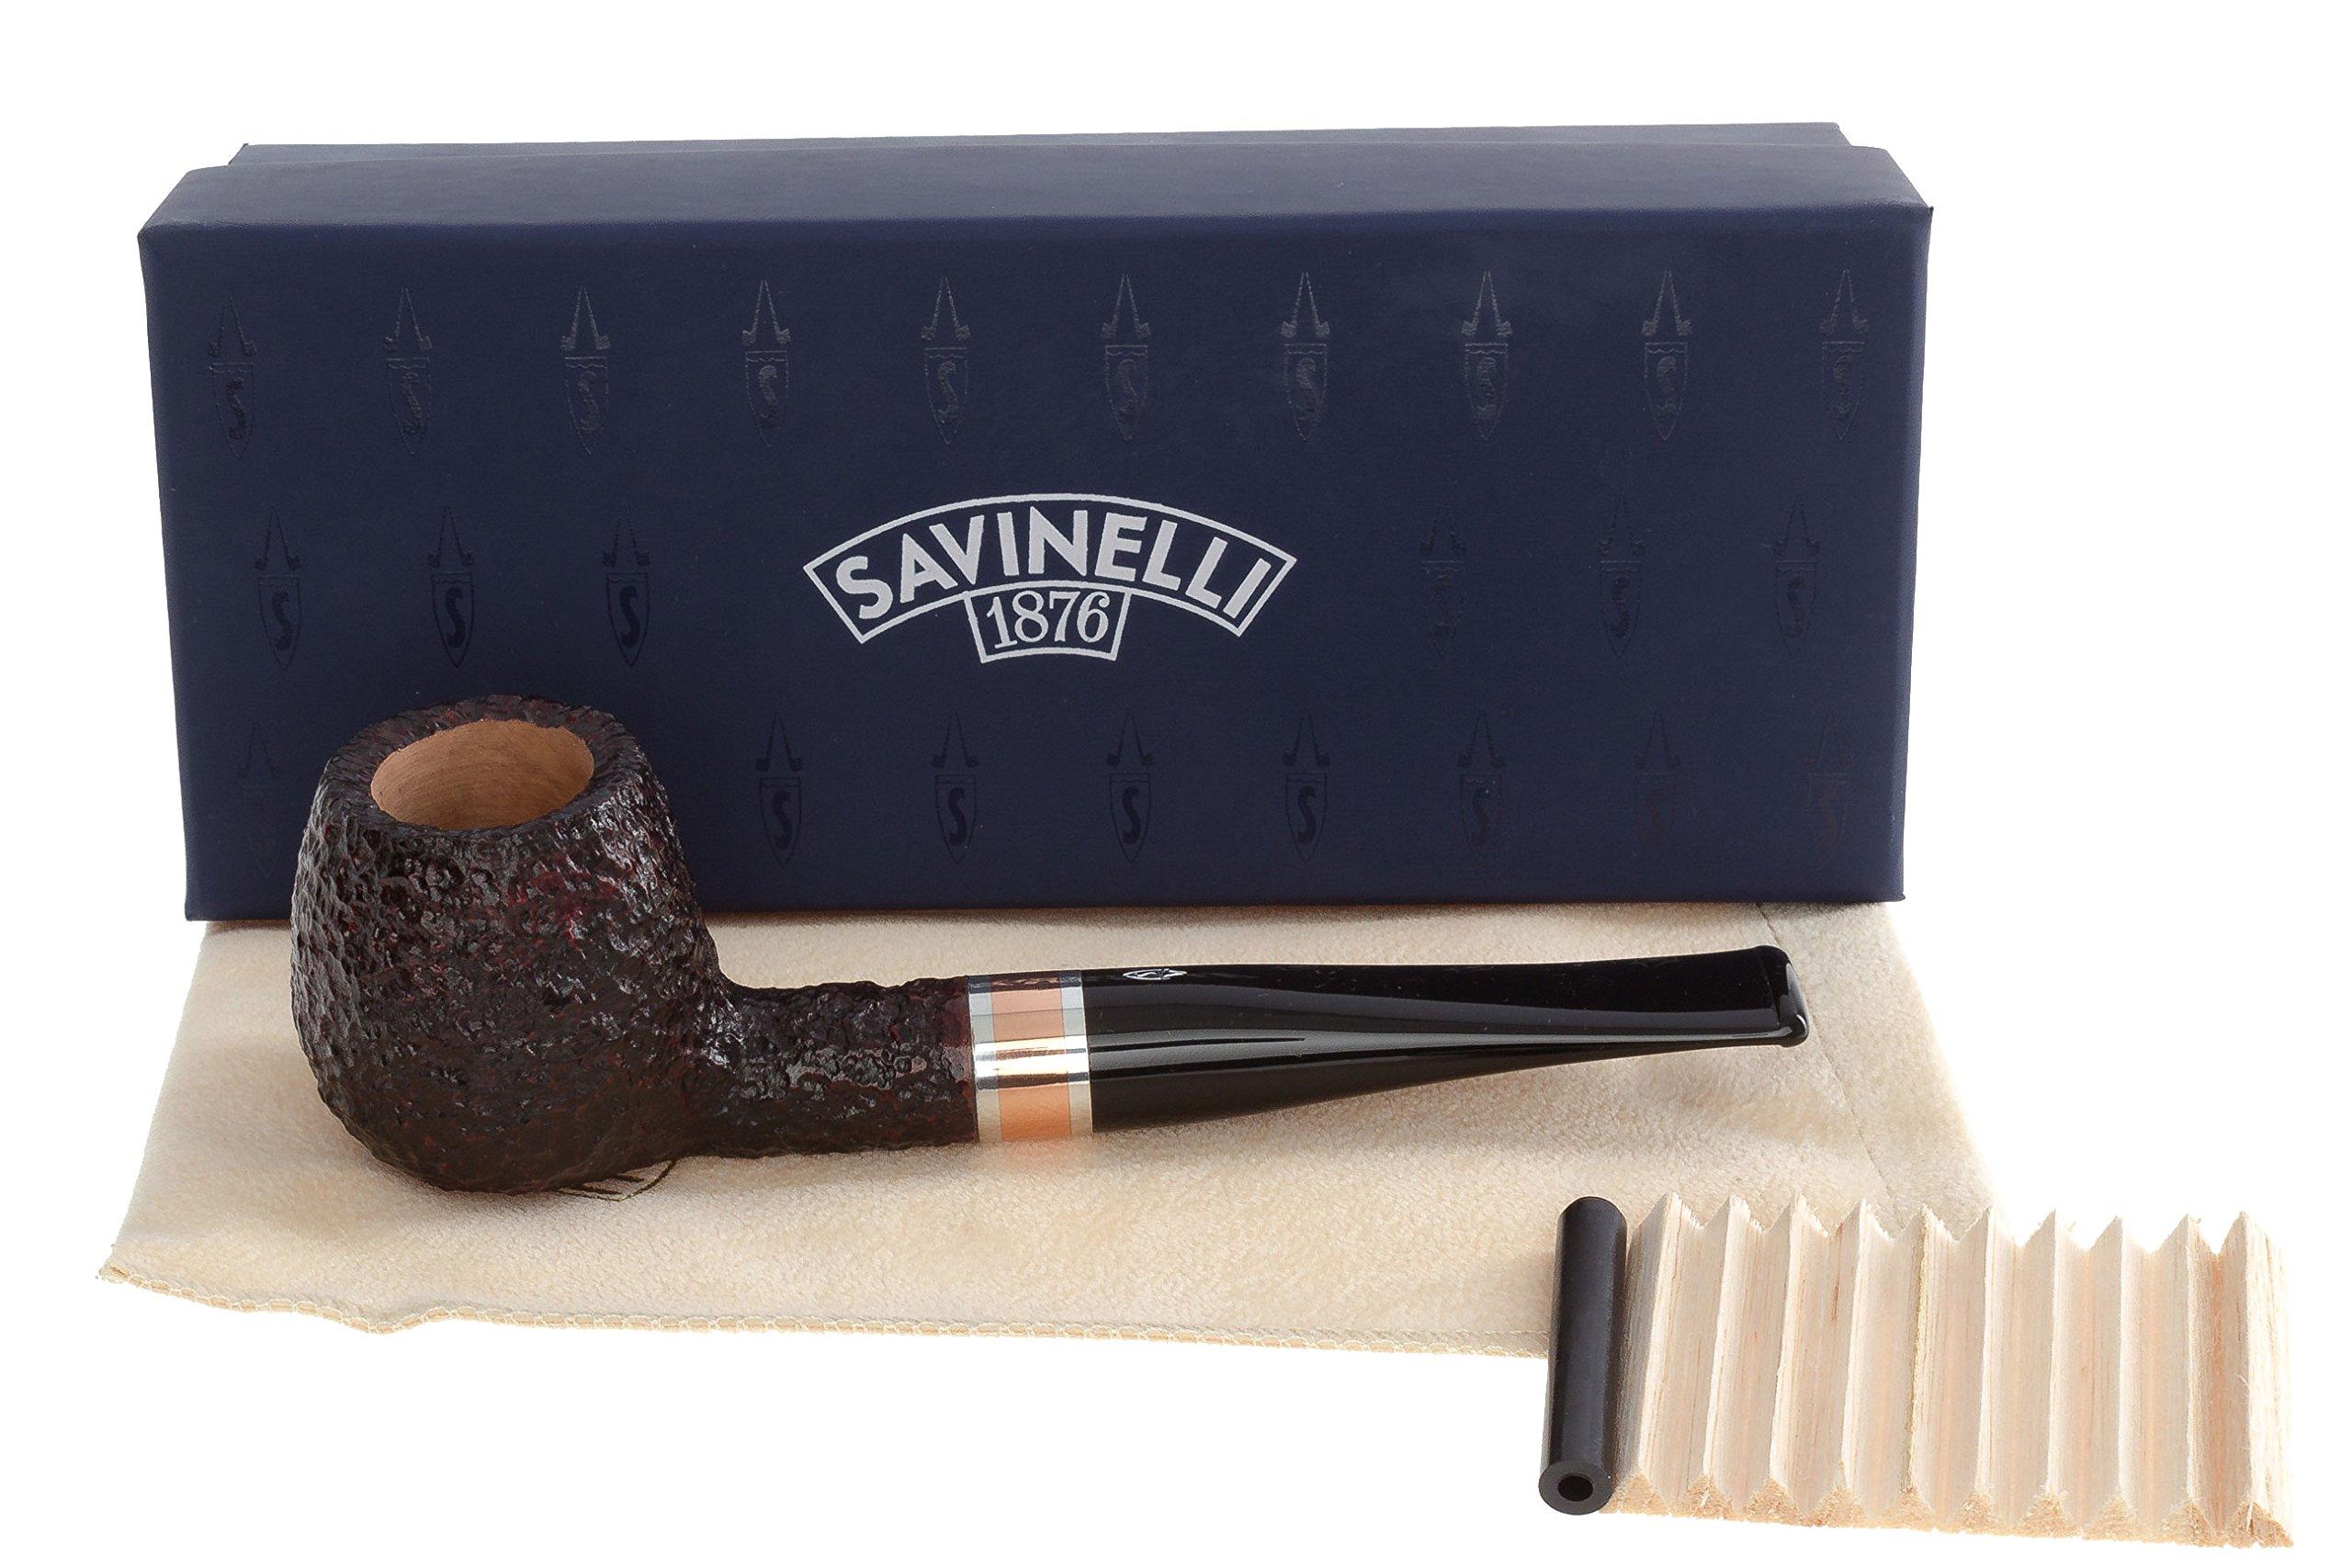 Savinelli Marte 207 Tobacco Pipe - Rustic